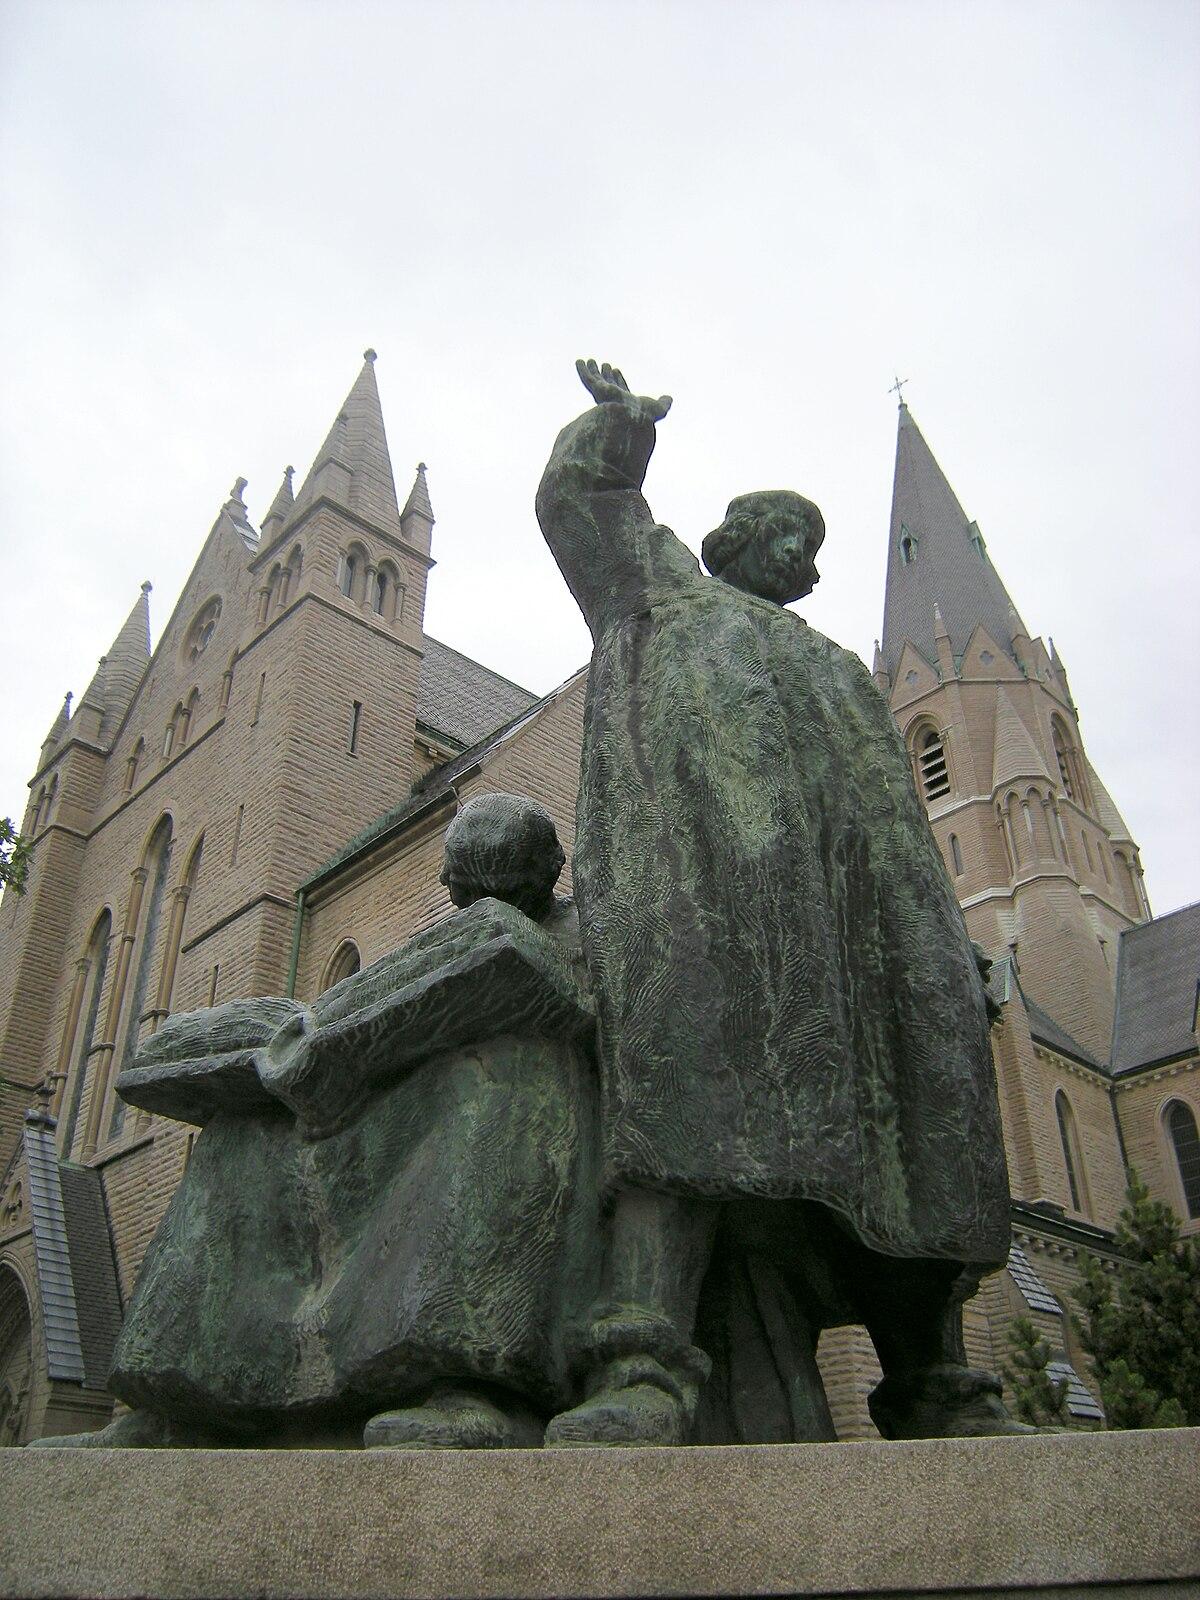 Category:Olaus Petri - Wikimedia Commons